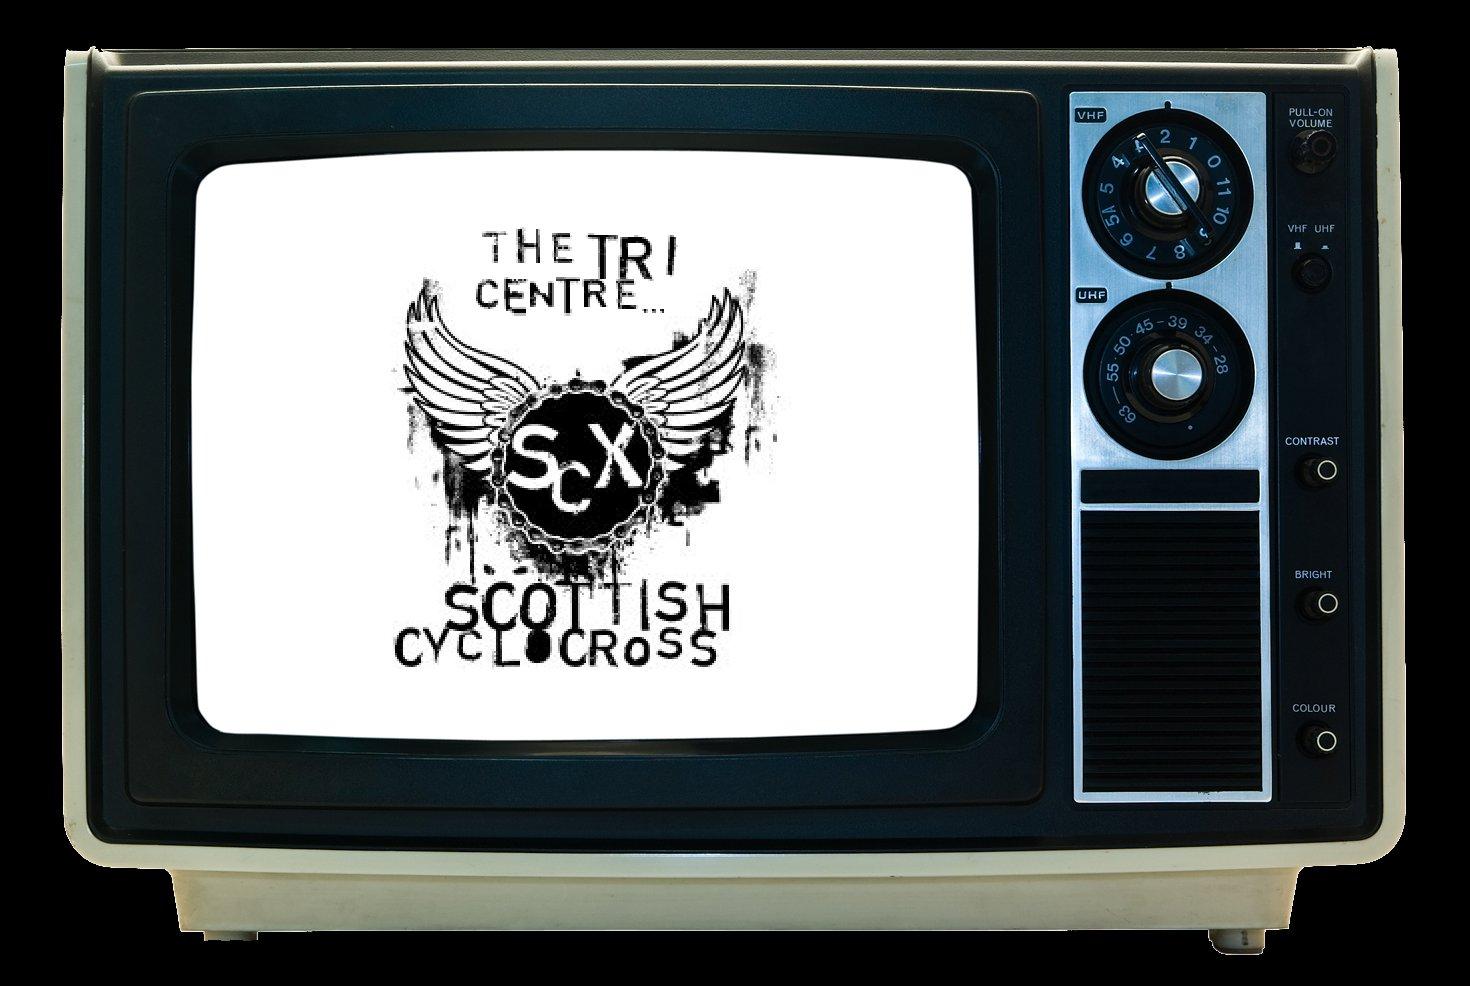 scottish cyclocross association scx tv. Black Bedroom Furniture Sets. Home Design Ideas